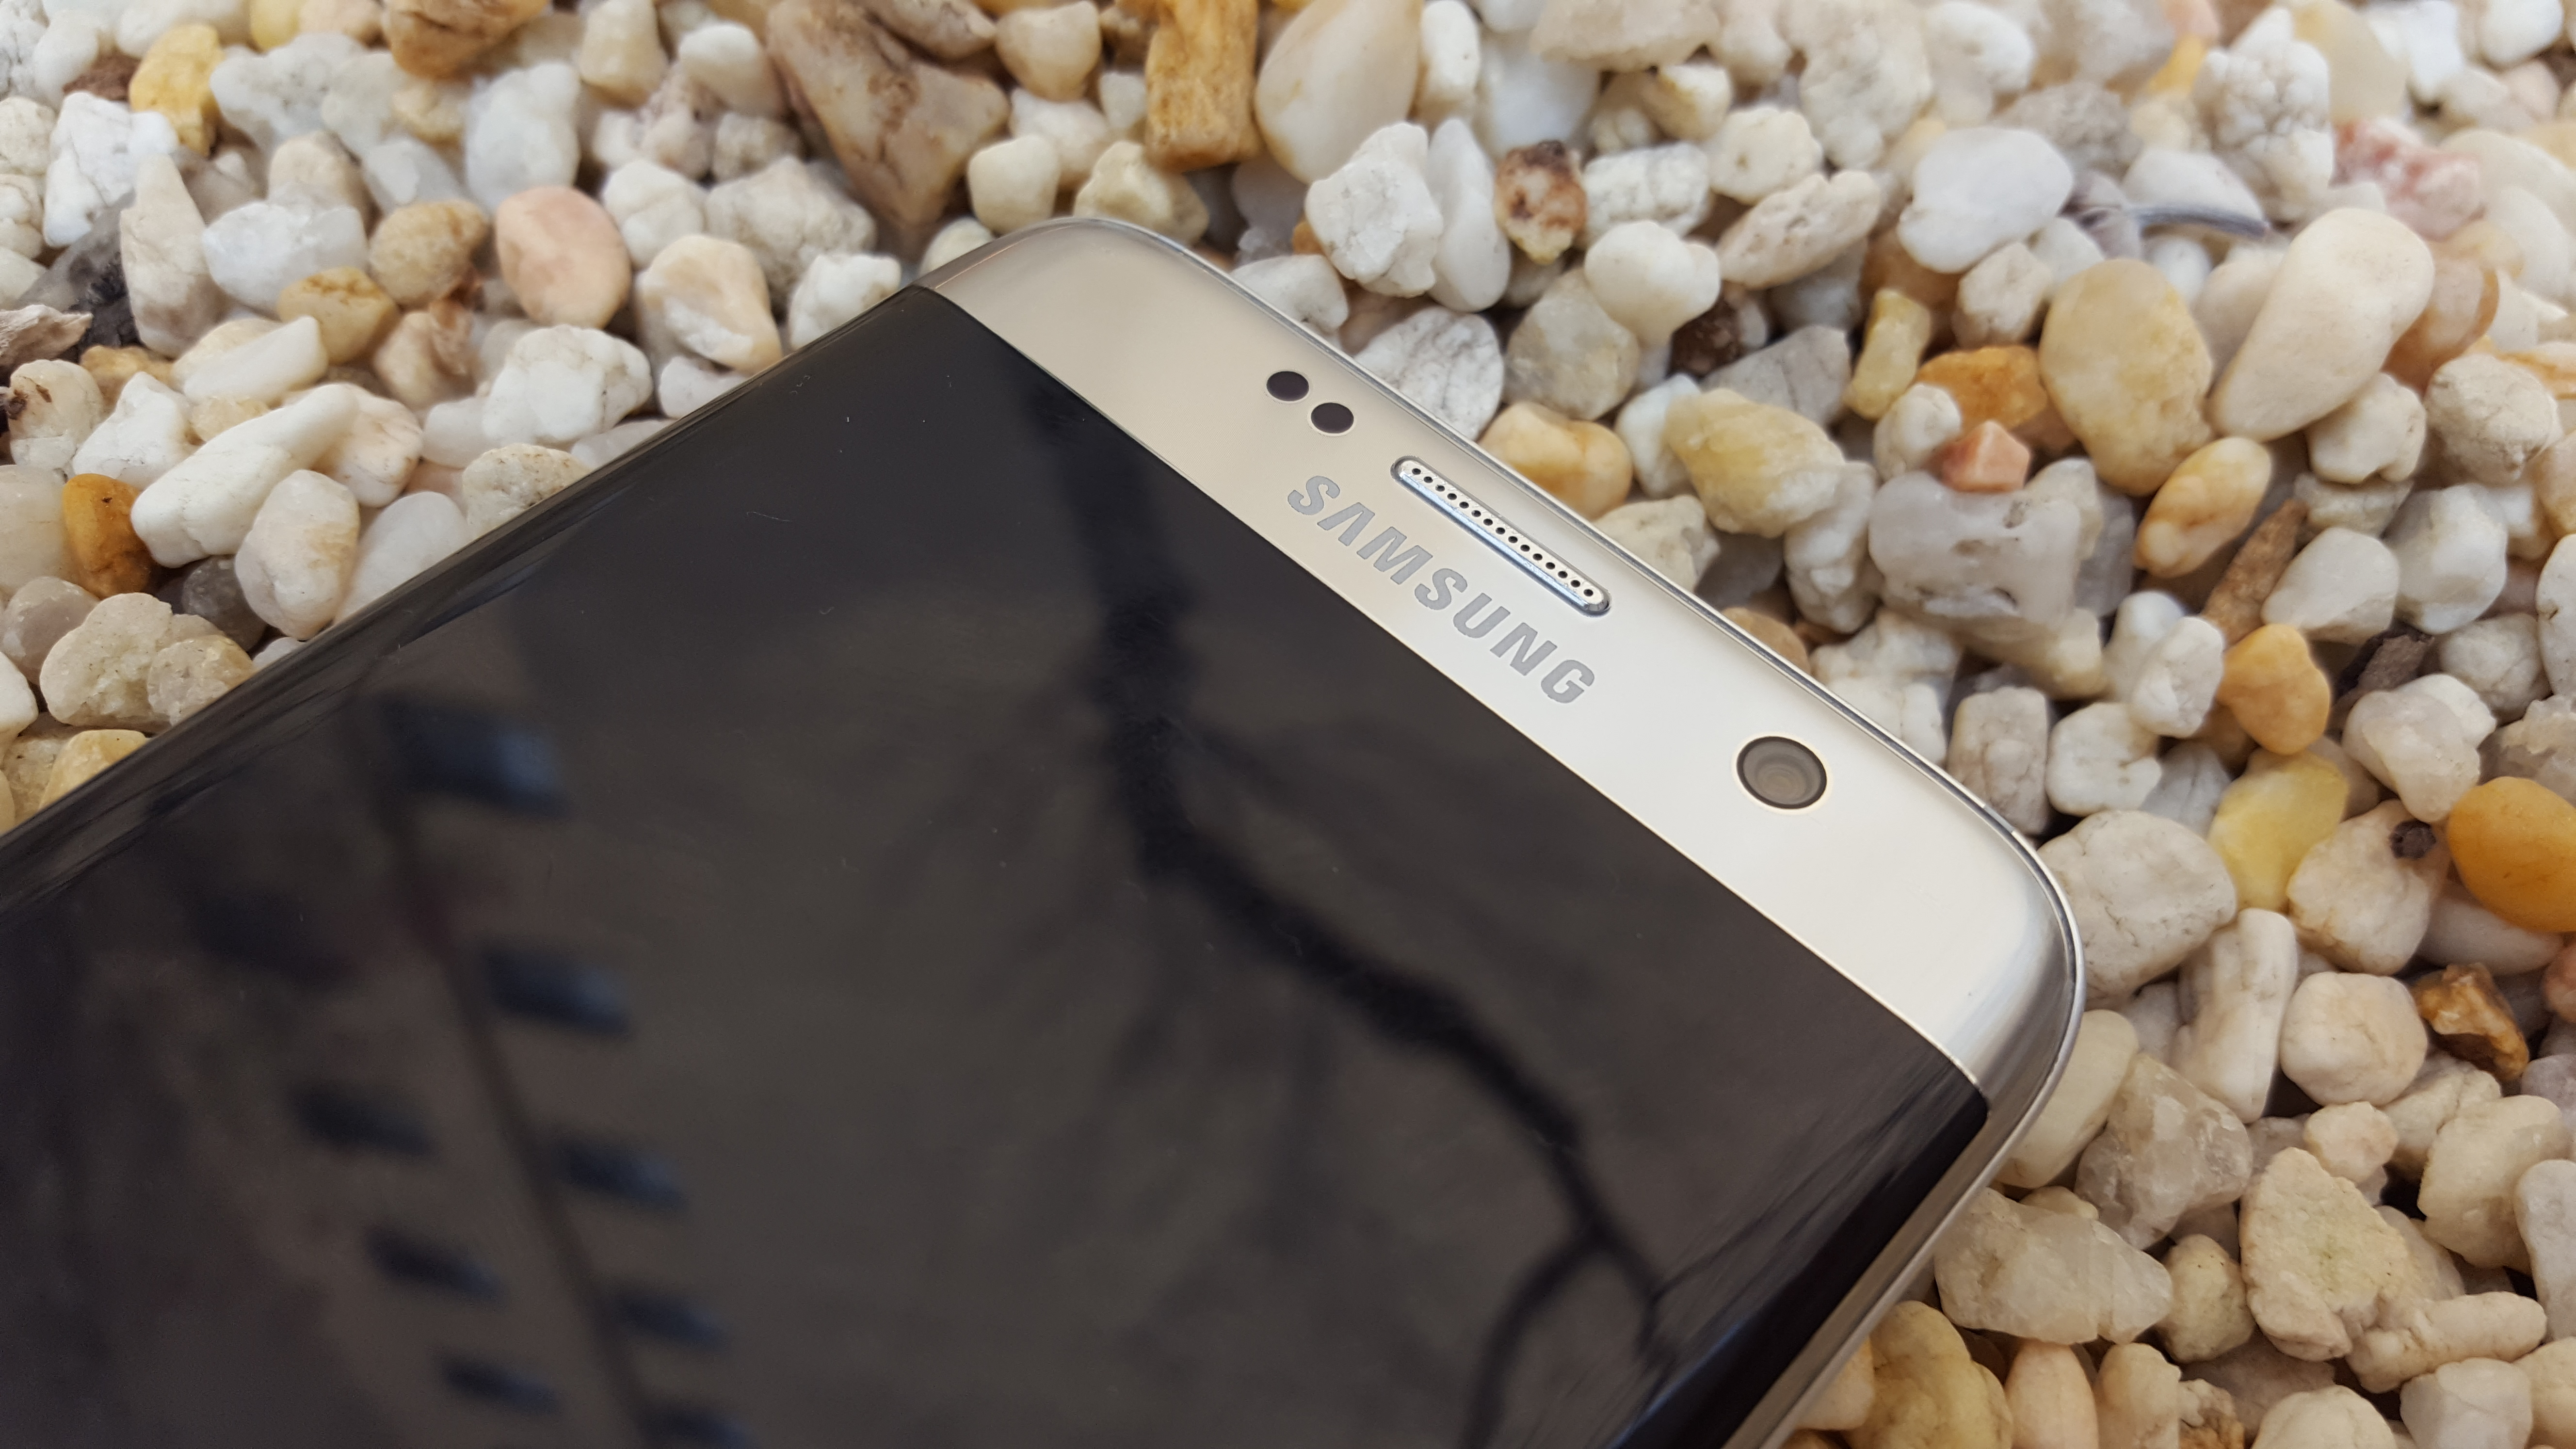 Samsung Announces Graphene Ball Battery